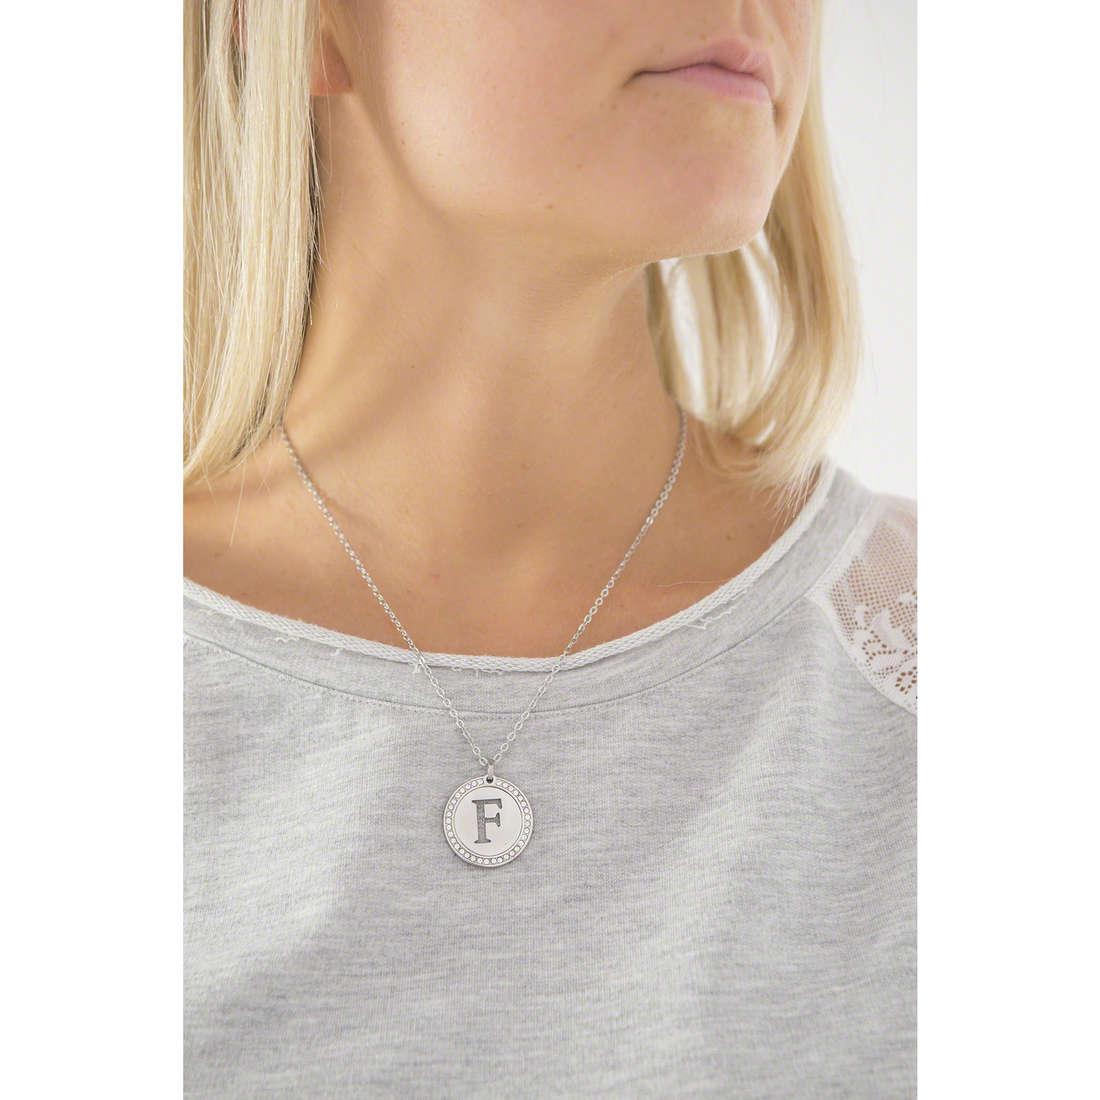 Sagapò necklaces LetteRing woman SLR06 indosso